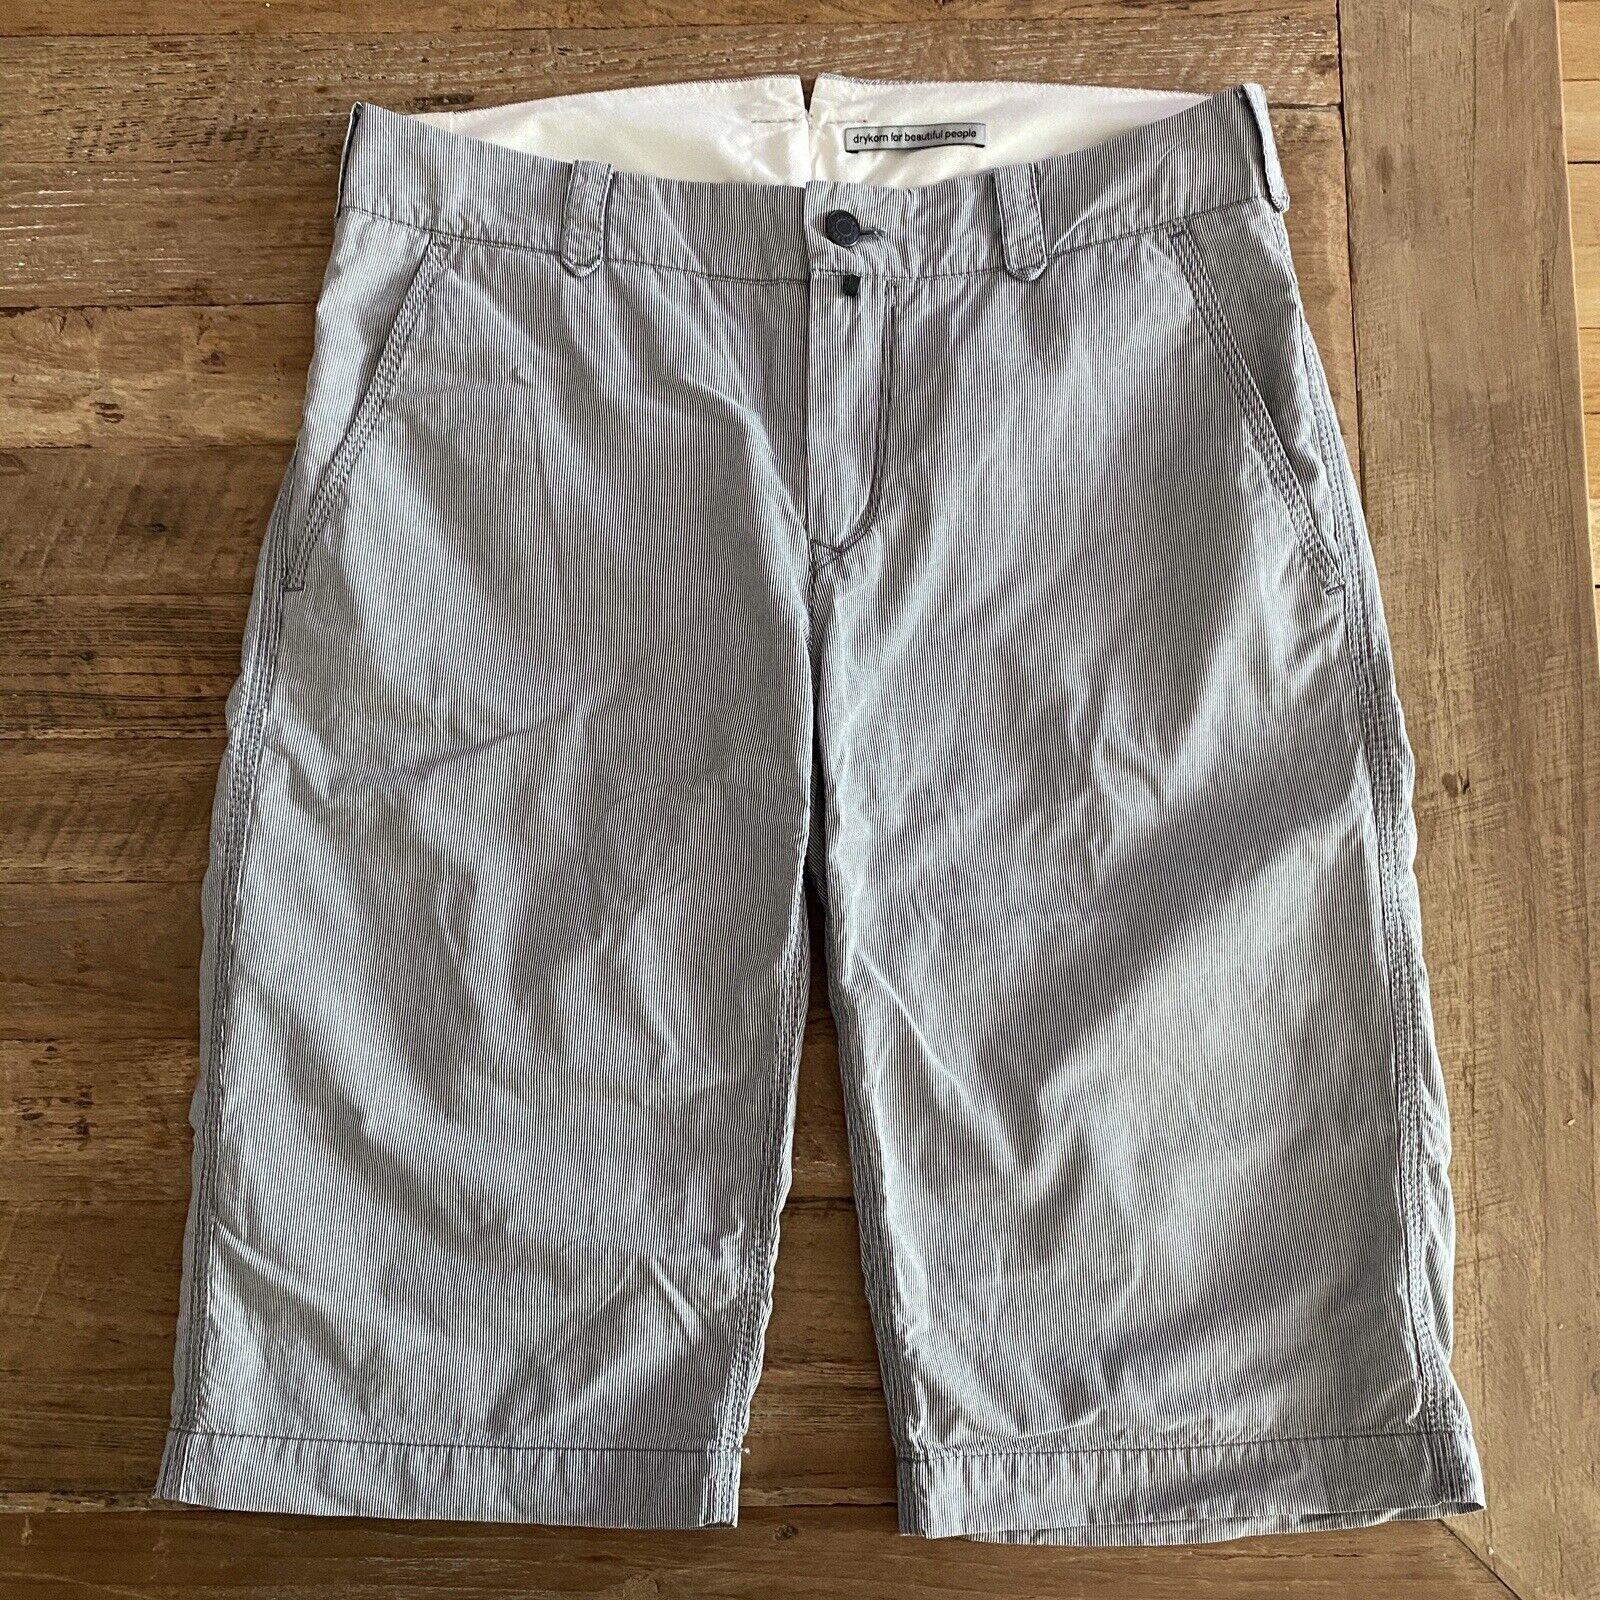 DRYKORN Bermudas Shorts Chino inch27 Gr. S / 36 grau-weiß fein gestreift *Neu